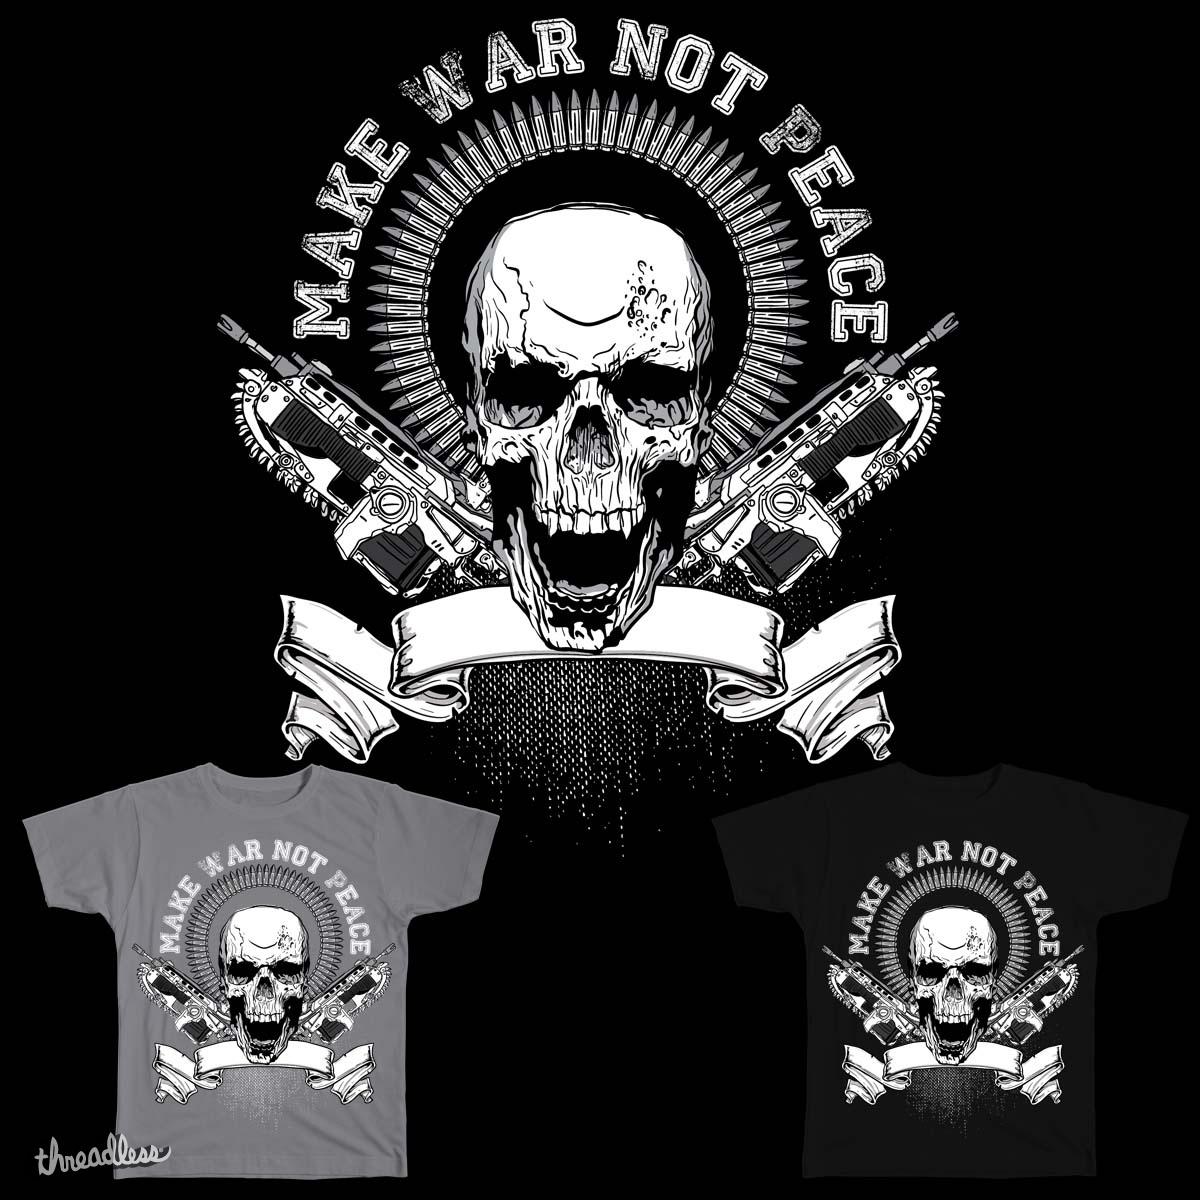 make war not peace by mistertomat on Threadless